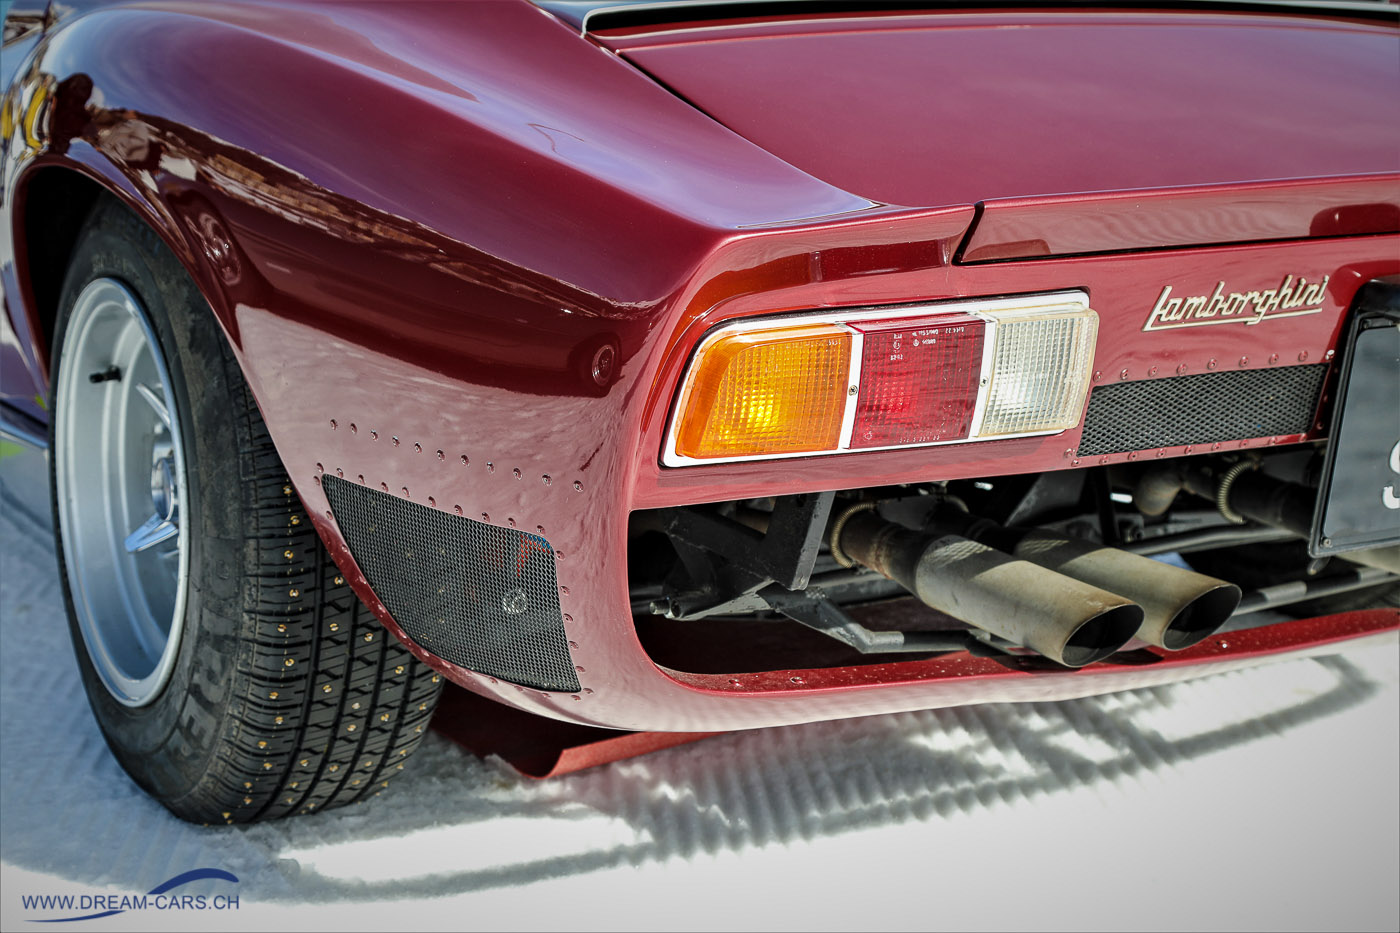 The Ice, Lamborghini Miura mit Spikesreifen